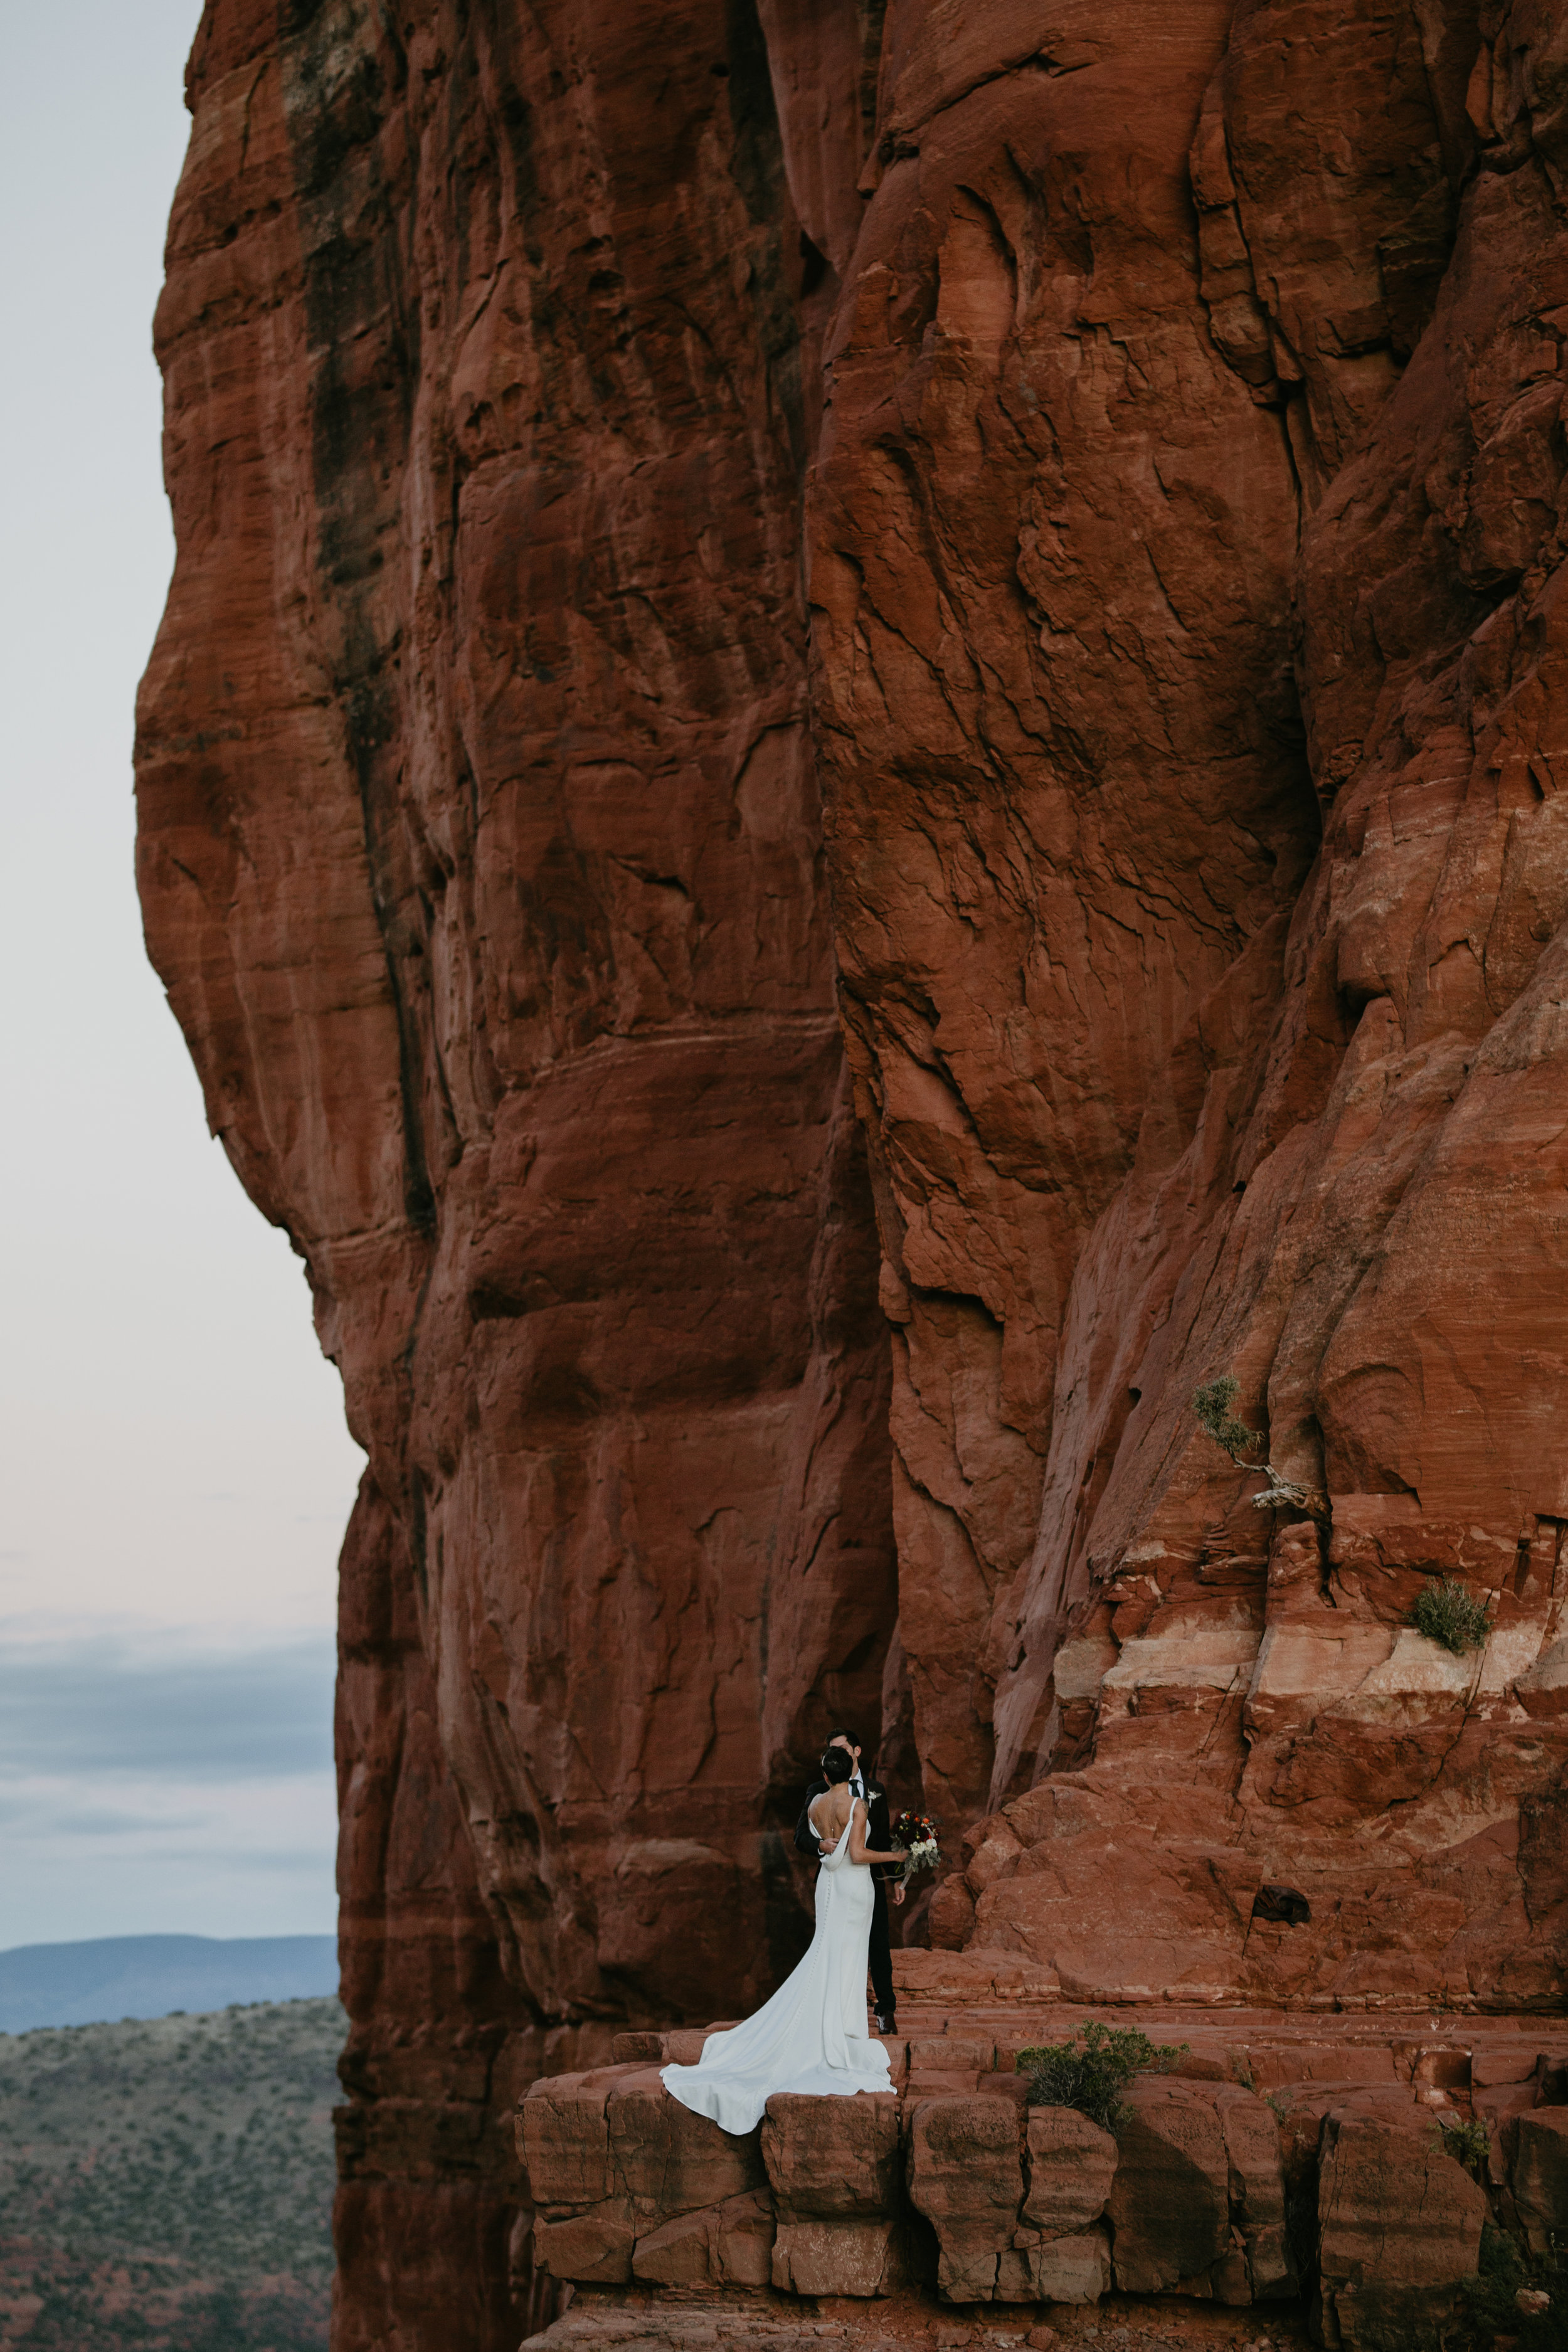 nicole-daacke-photography-sedona-arizona-adventurous-elopement-adventure-elope-photographer-cathedral-rock-sedona-vortex-intimate-wedding-hiking-elopement-photographer-11.jpg